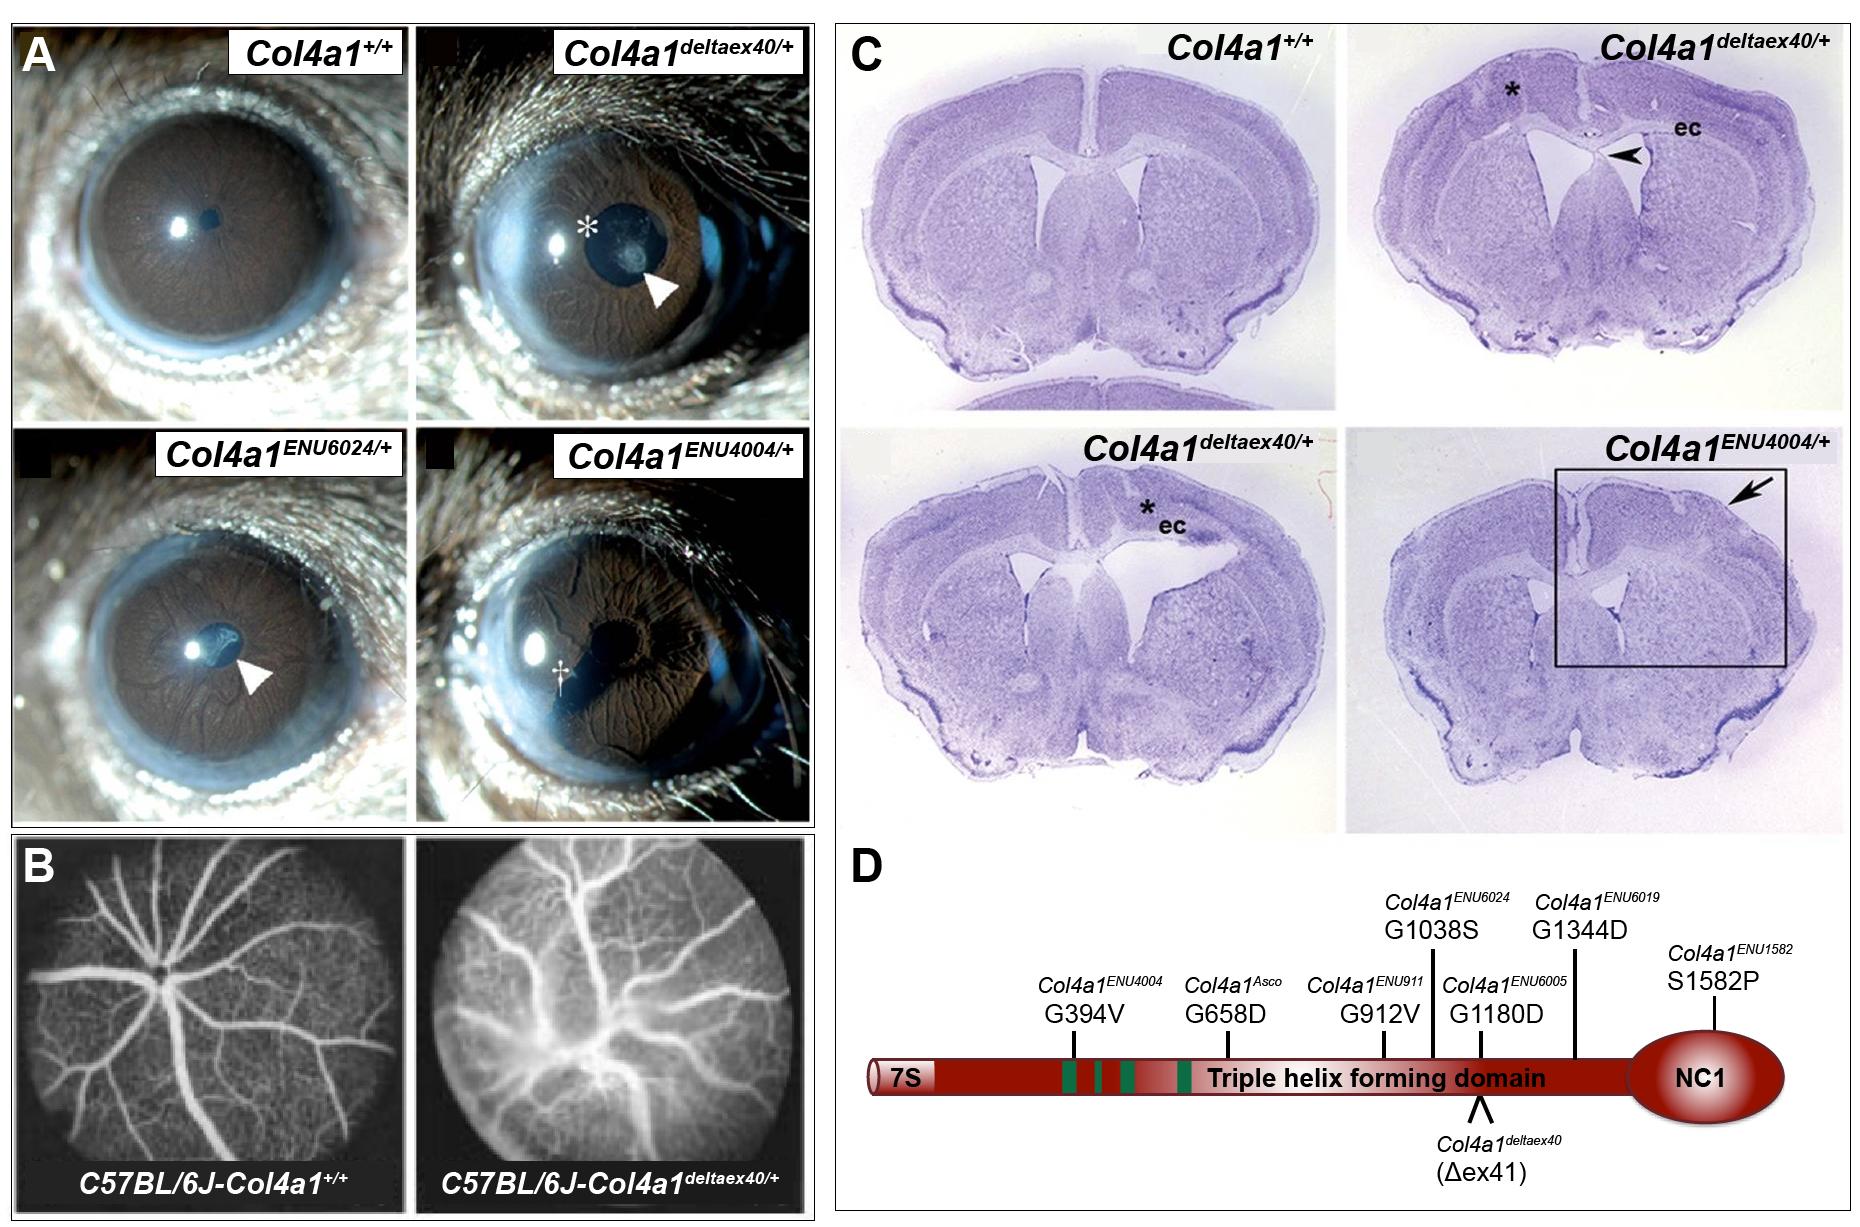 Spotlight on mouse models of human disease